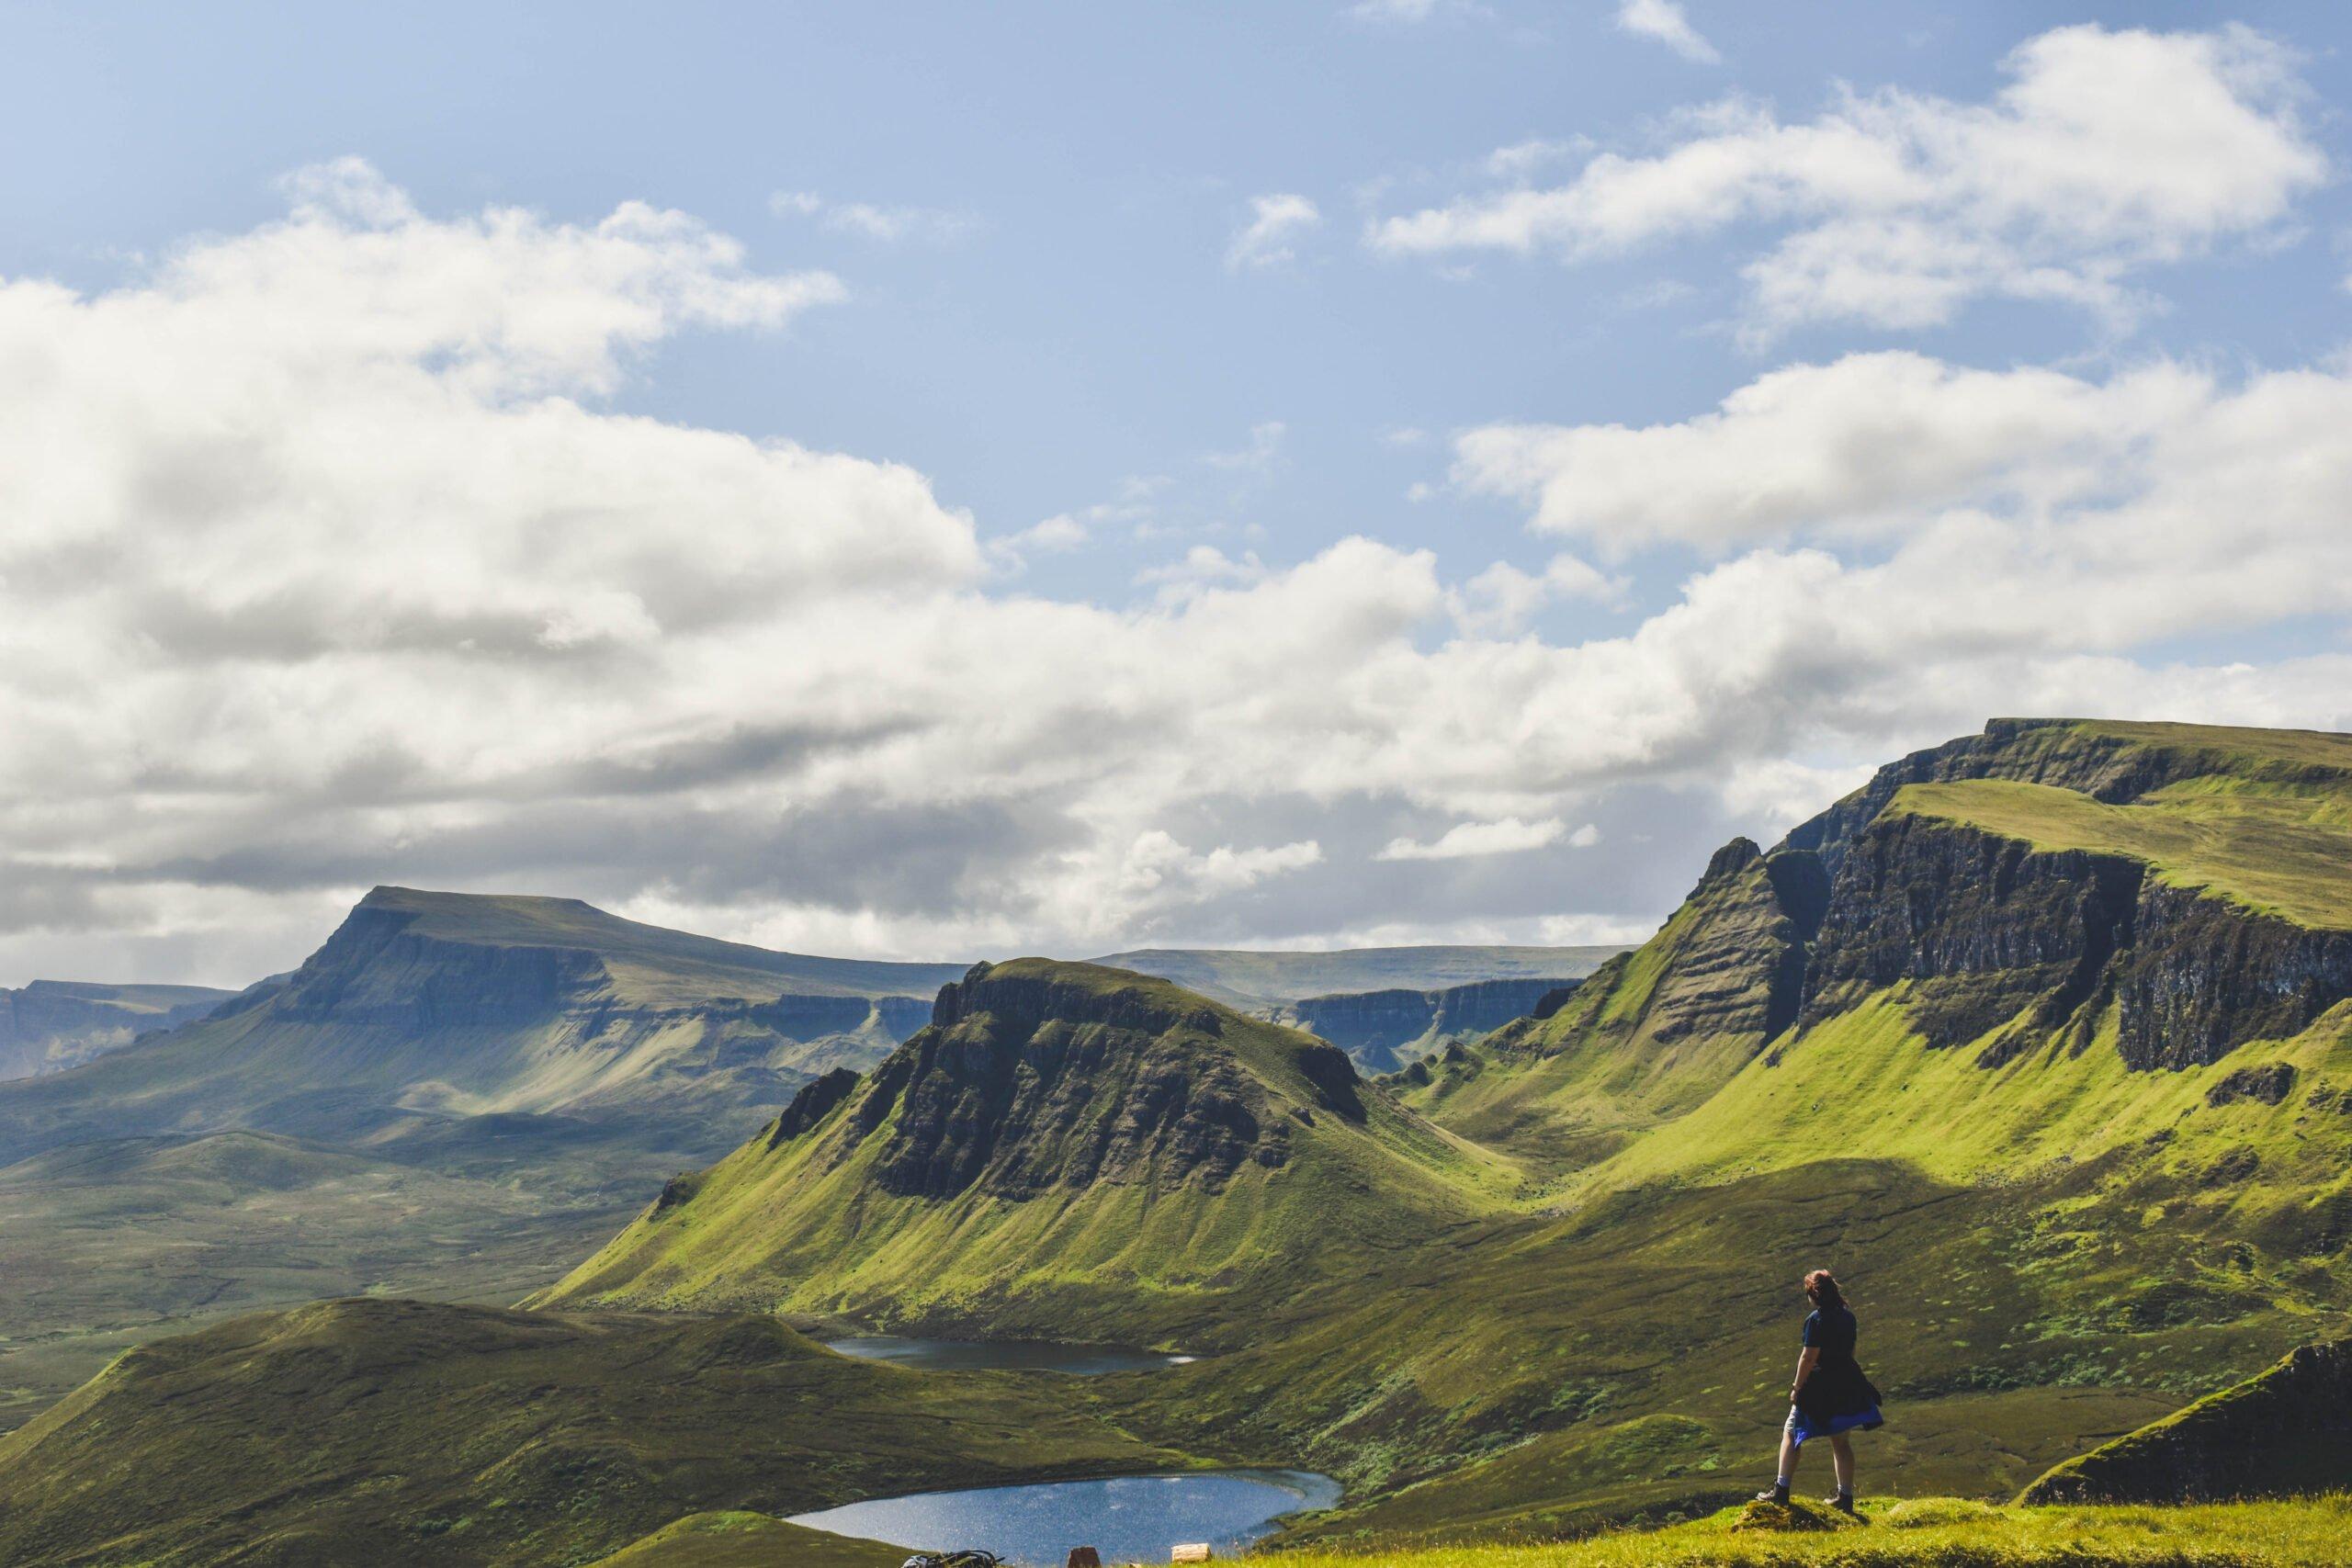 Visiting the Isle of Skye